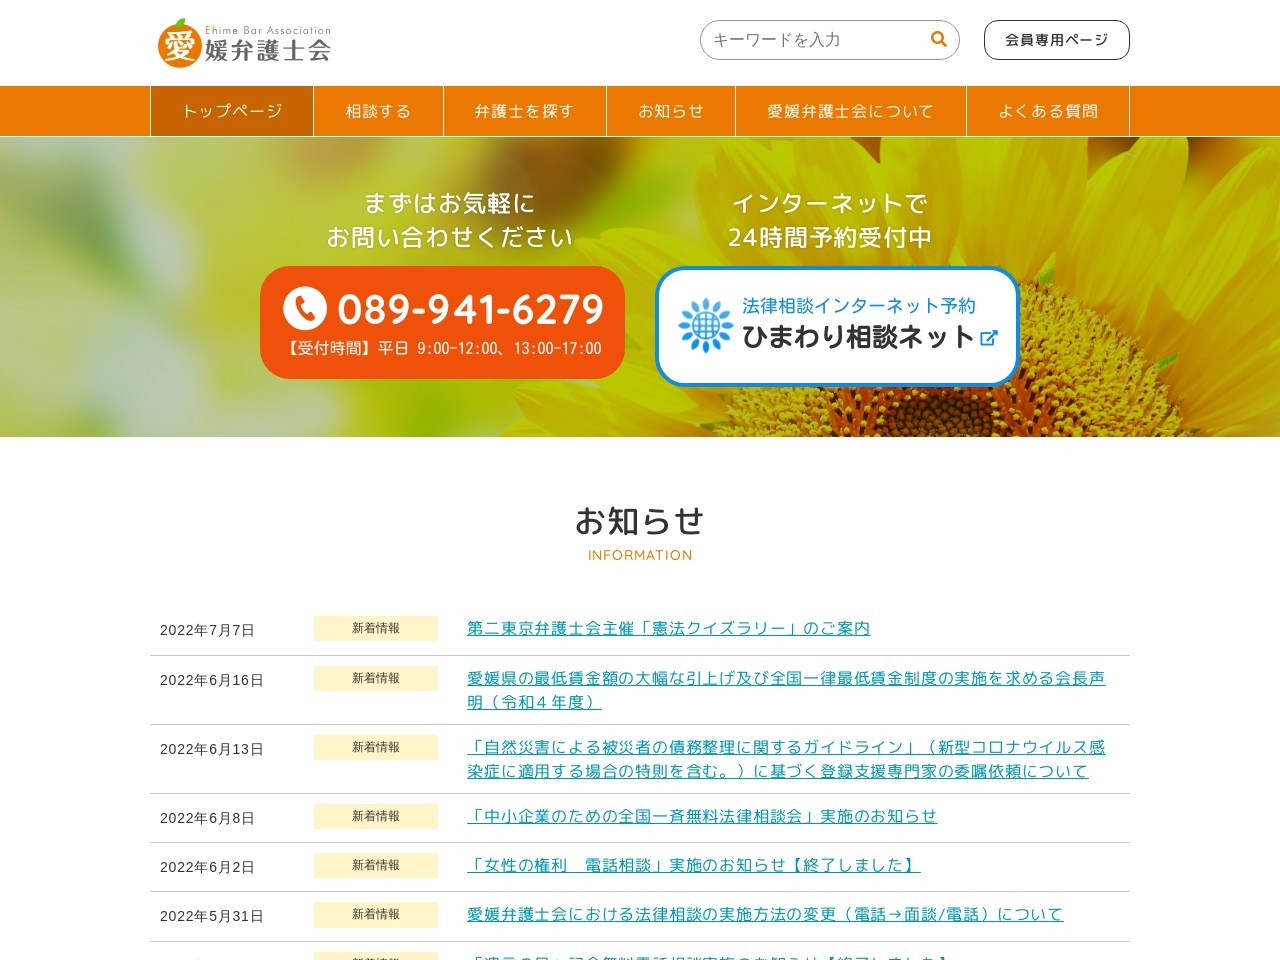 愛媛弁護士会 Ehime Bar Association